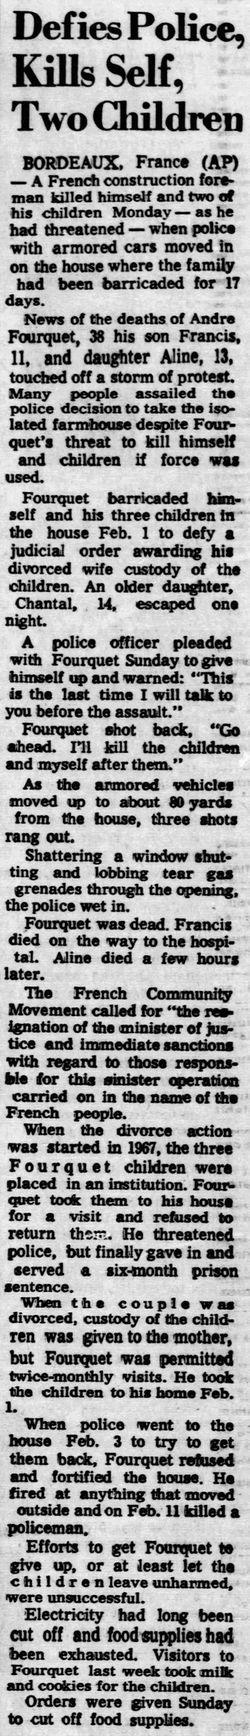 The El Paso Times, nº 49, 18/02/1969, p. 7